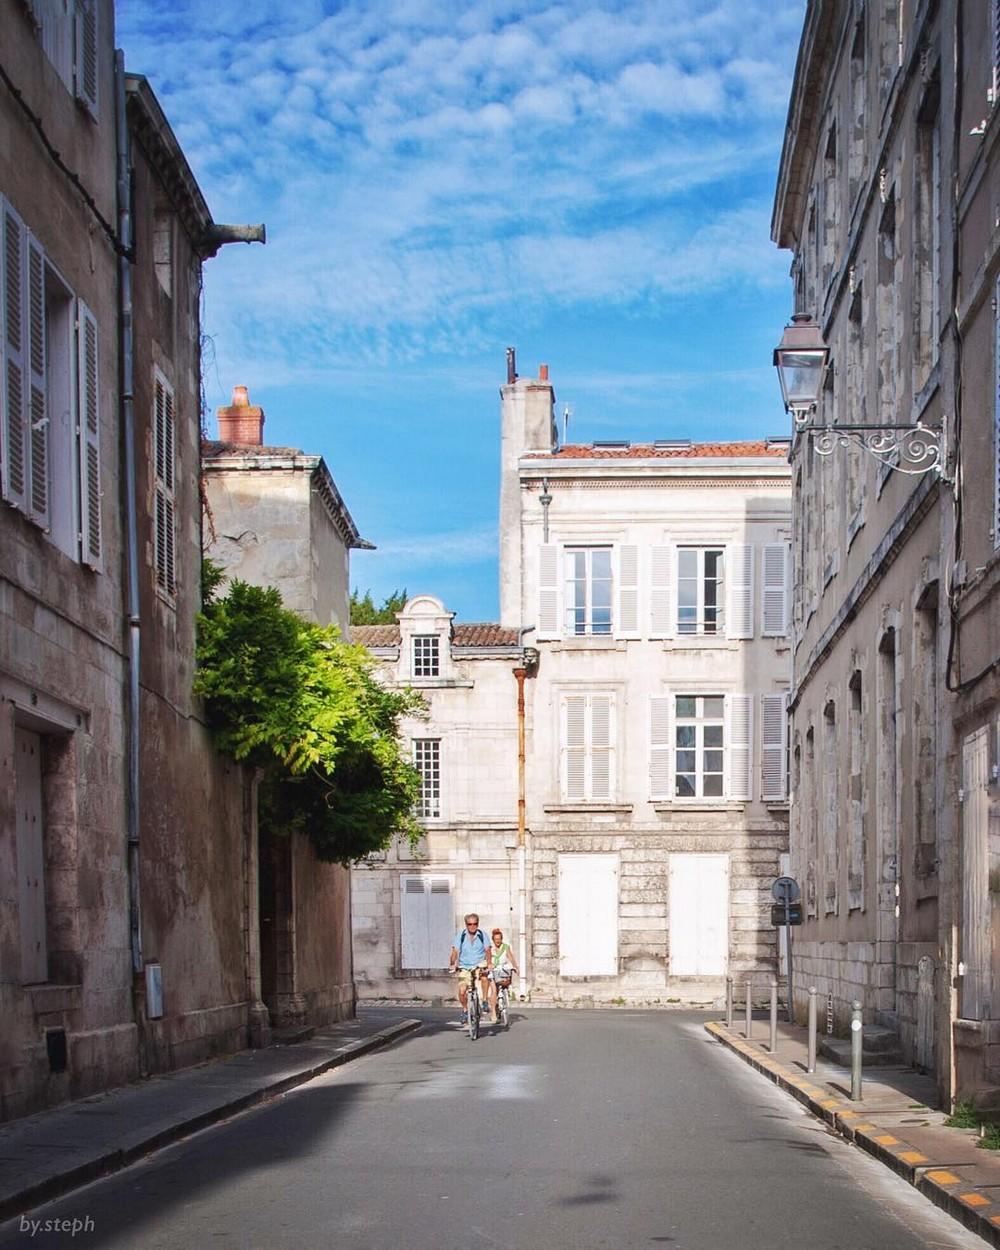 Потрясающие снимки улиц Парижа